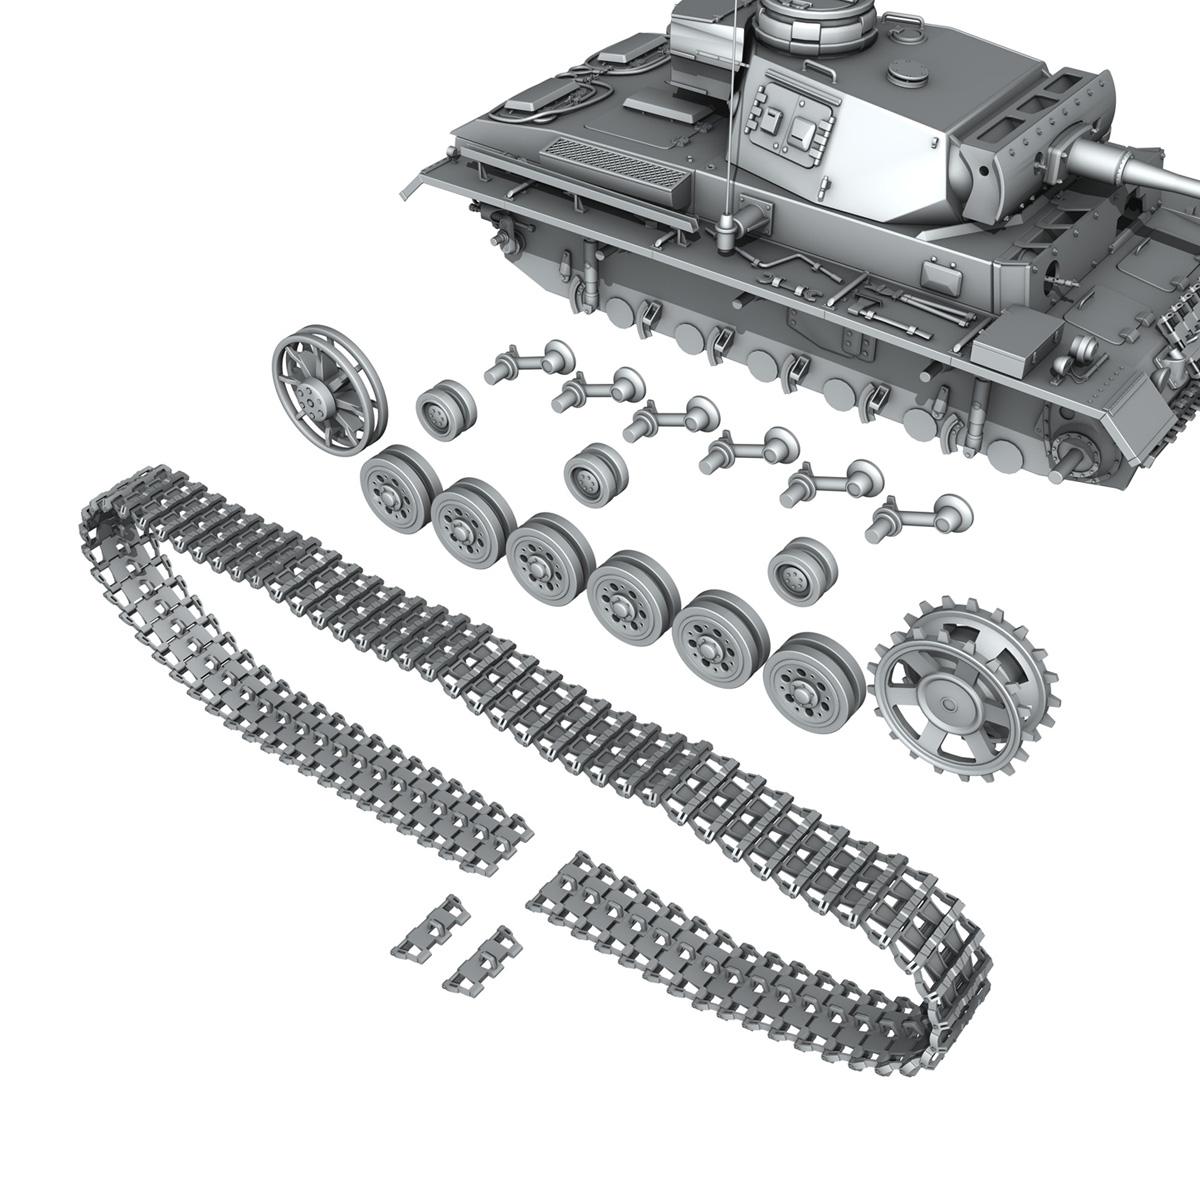 pzkpfw iii – panzerkampfwagen iii – ausf.l 3d model 3ds fbx c4d lwo obj 252162